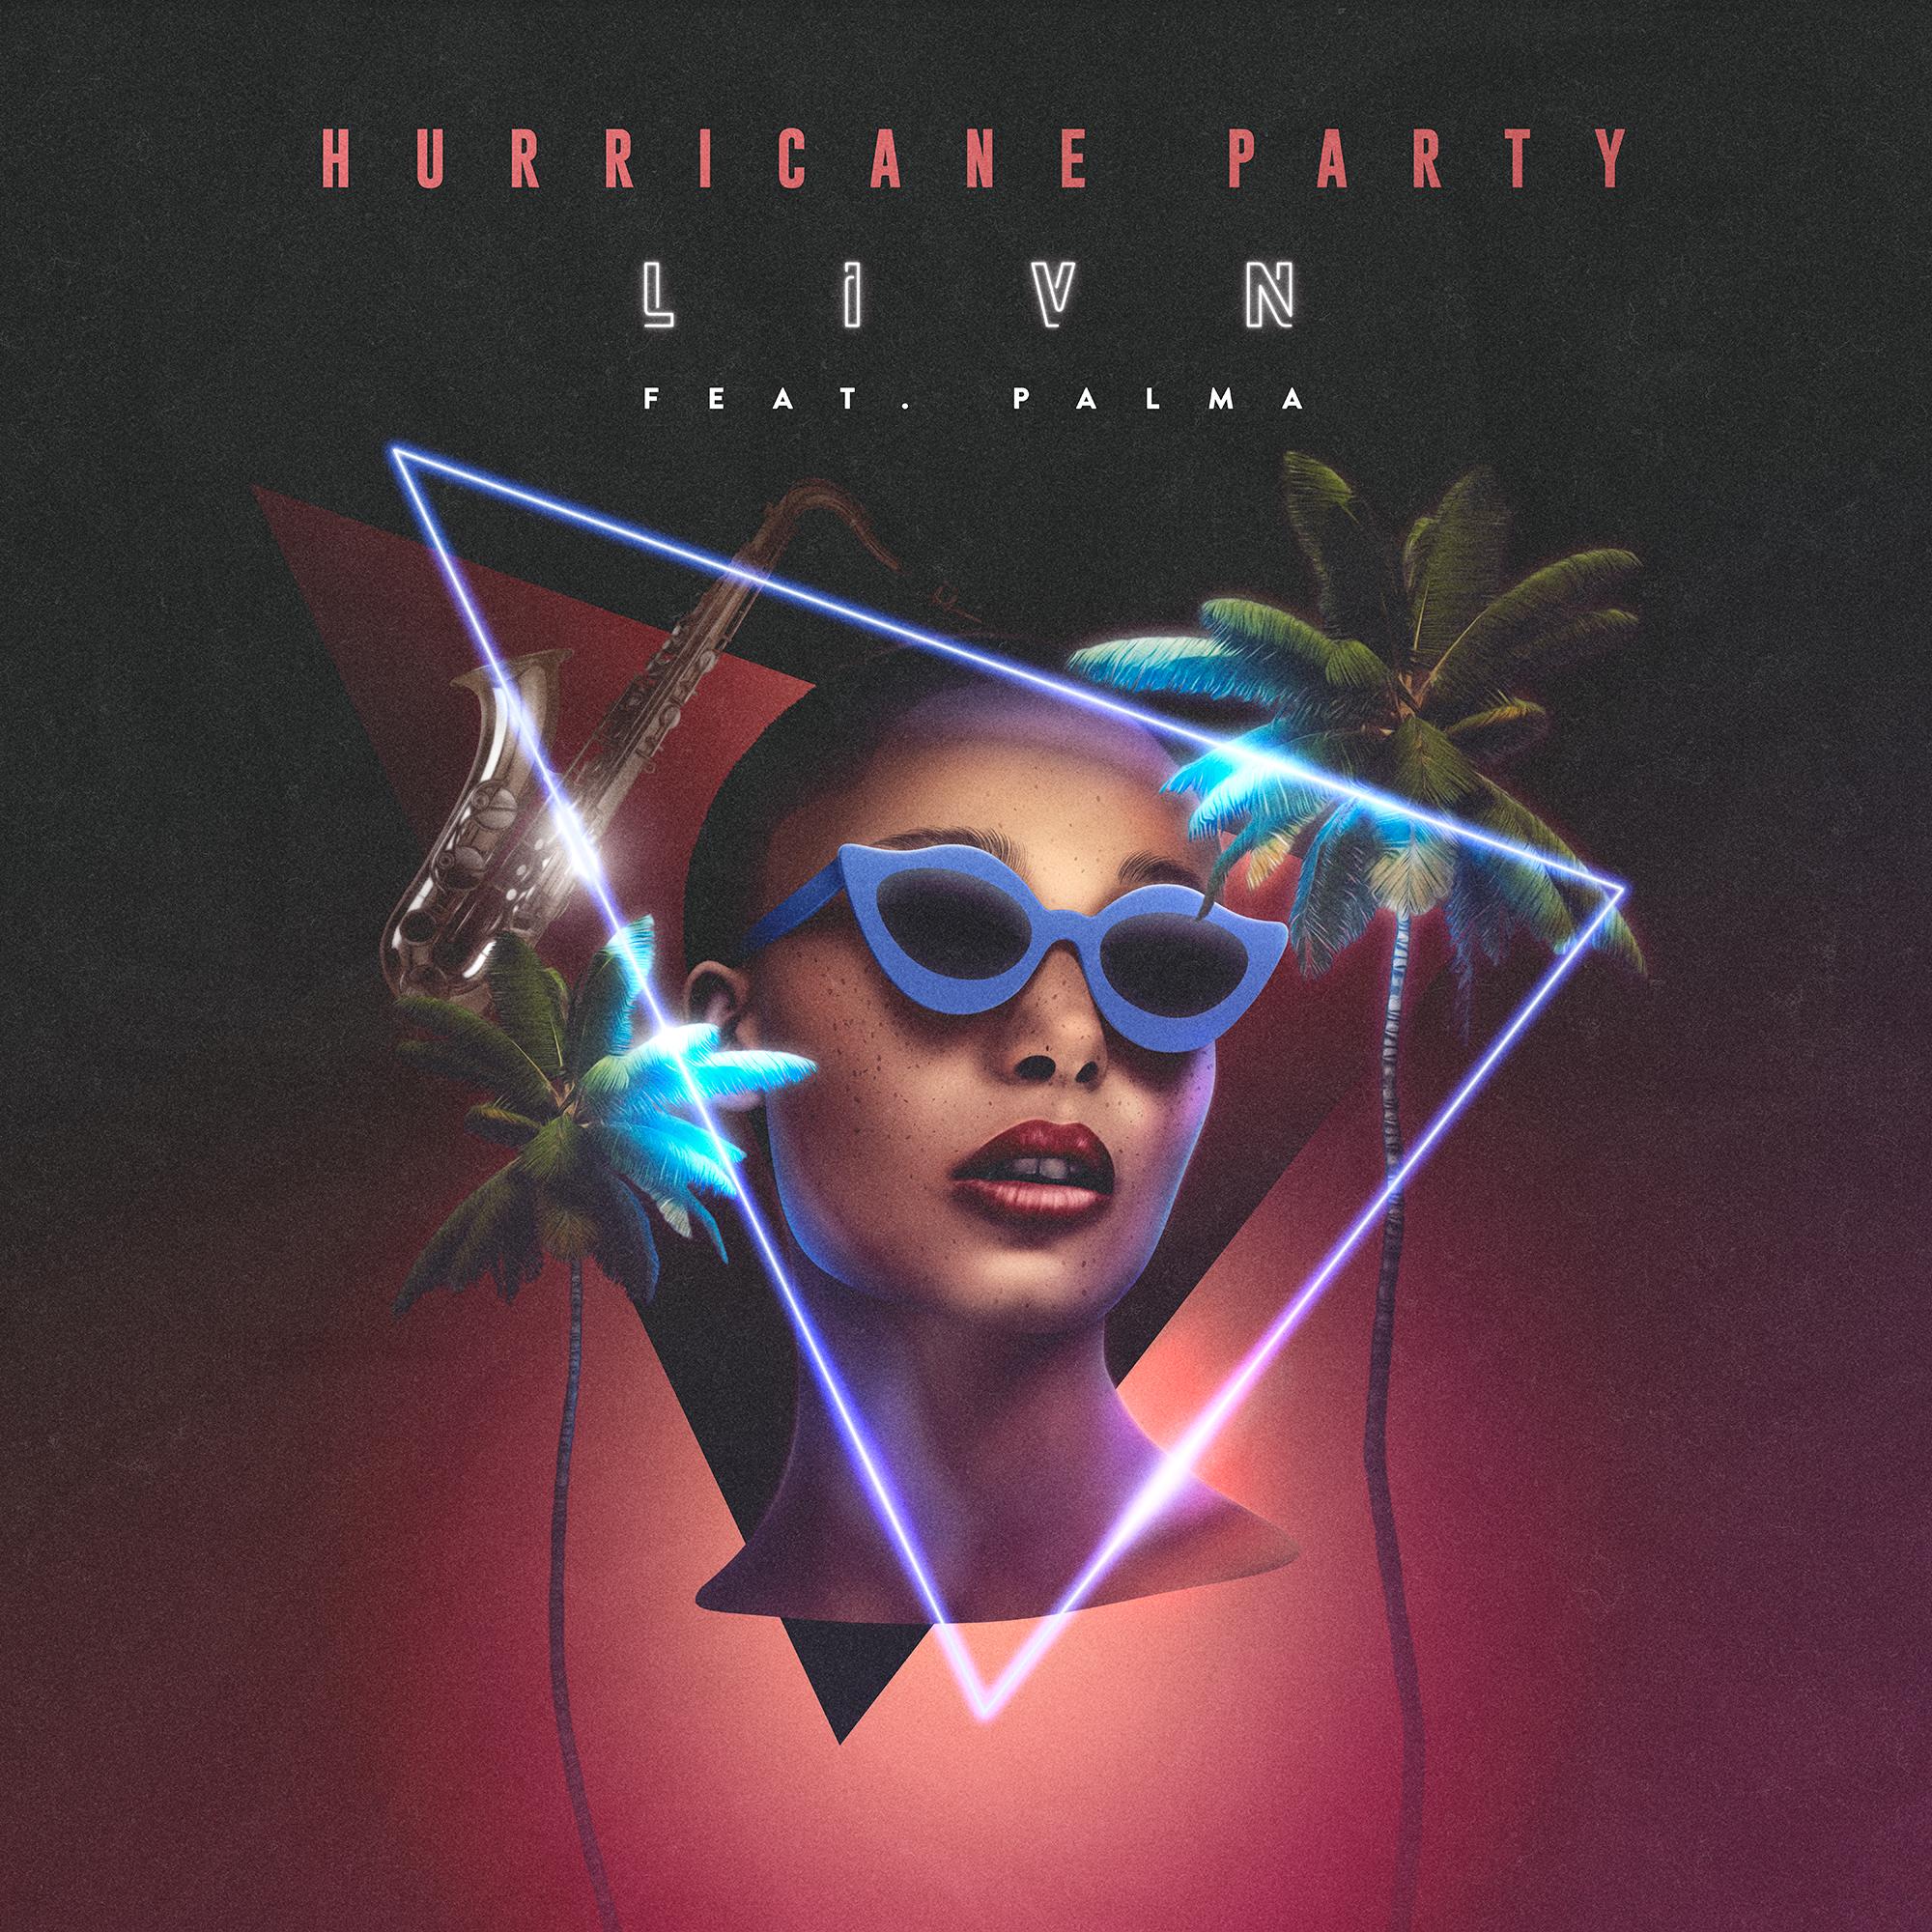 hurricane party single livn